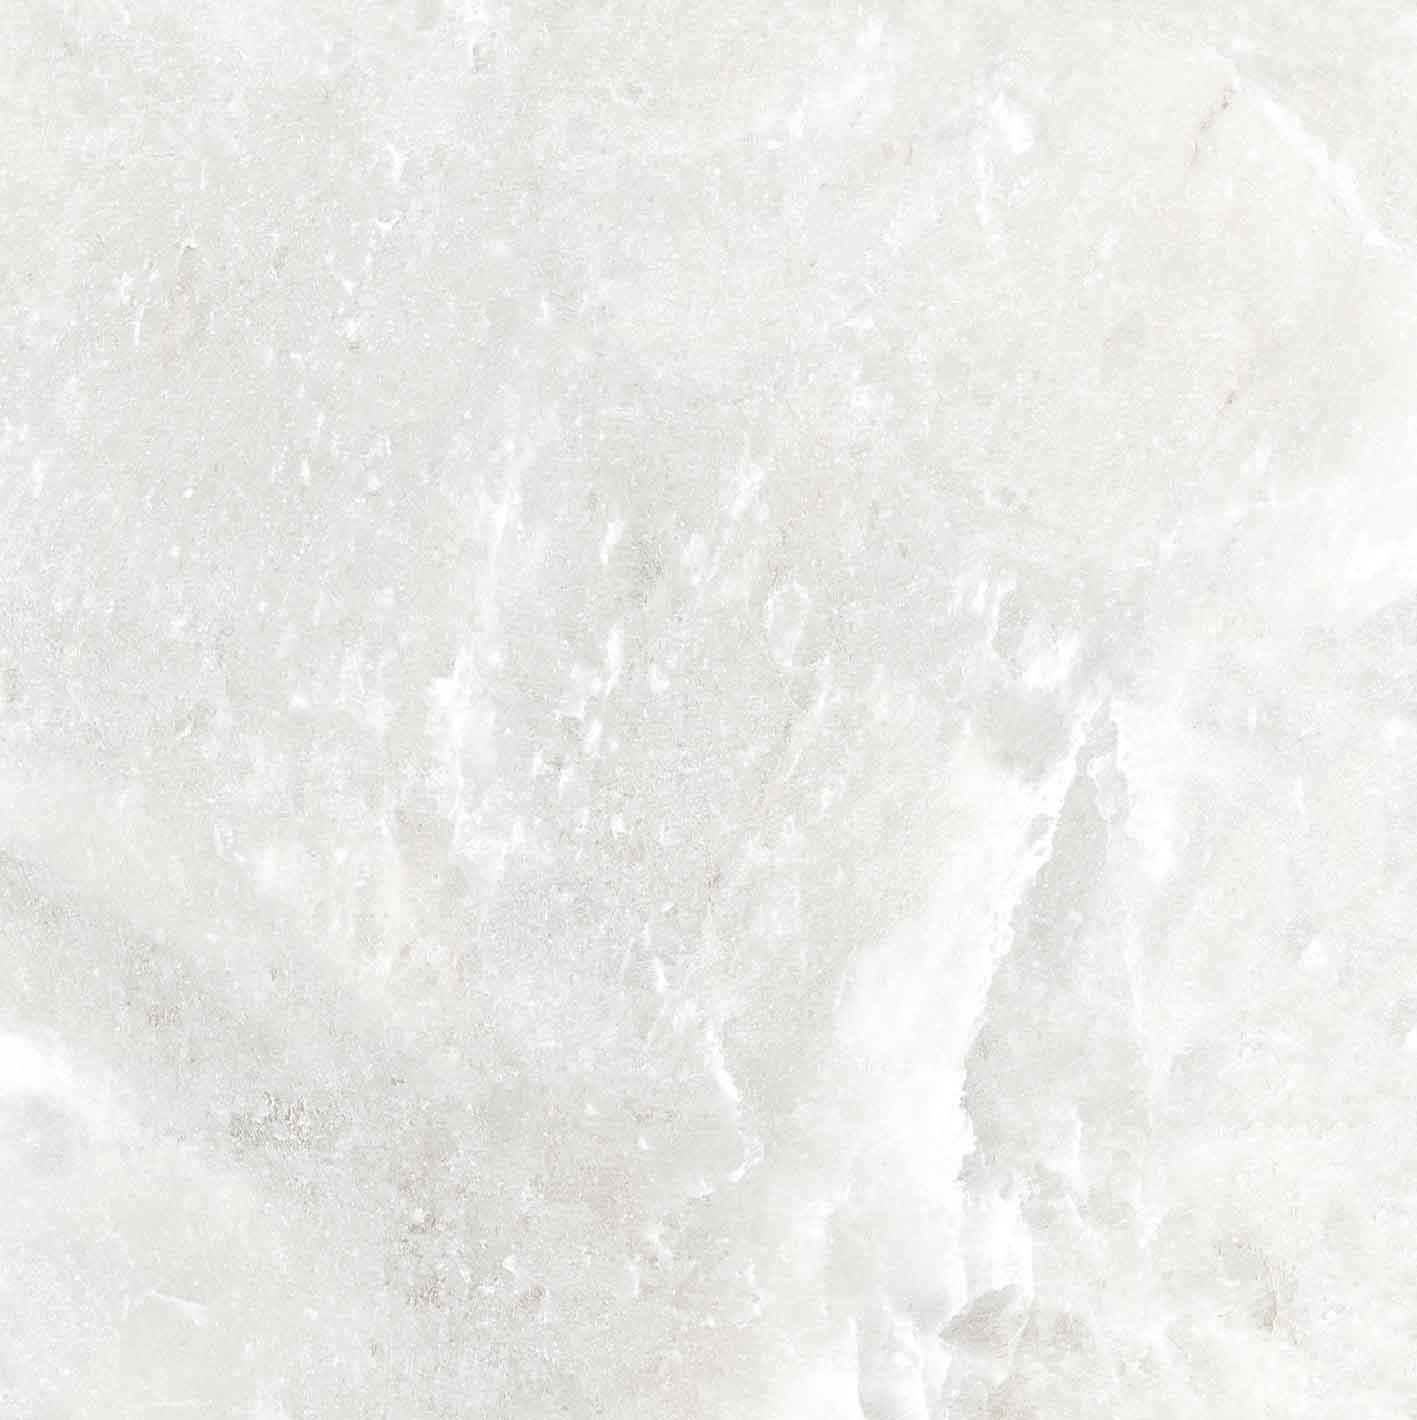 Rock Salt of Cerim White Gold Matte 6mm 120 x 120